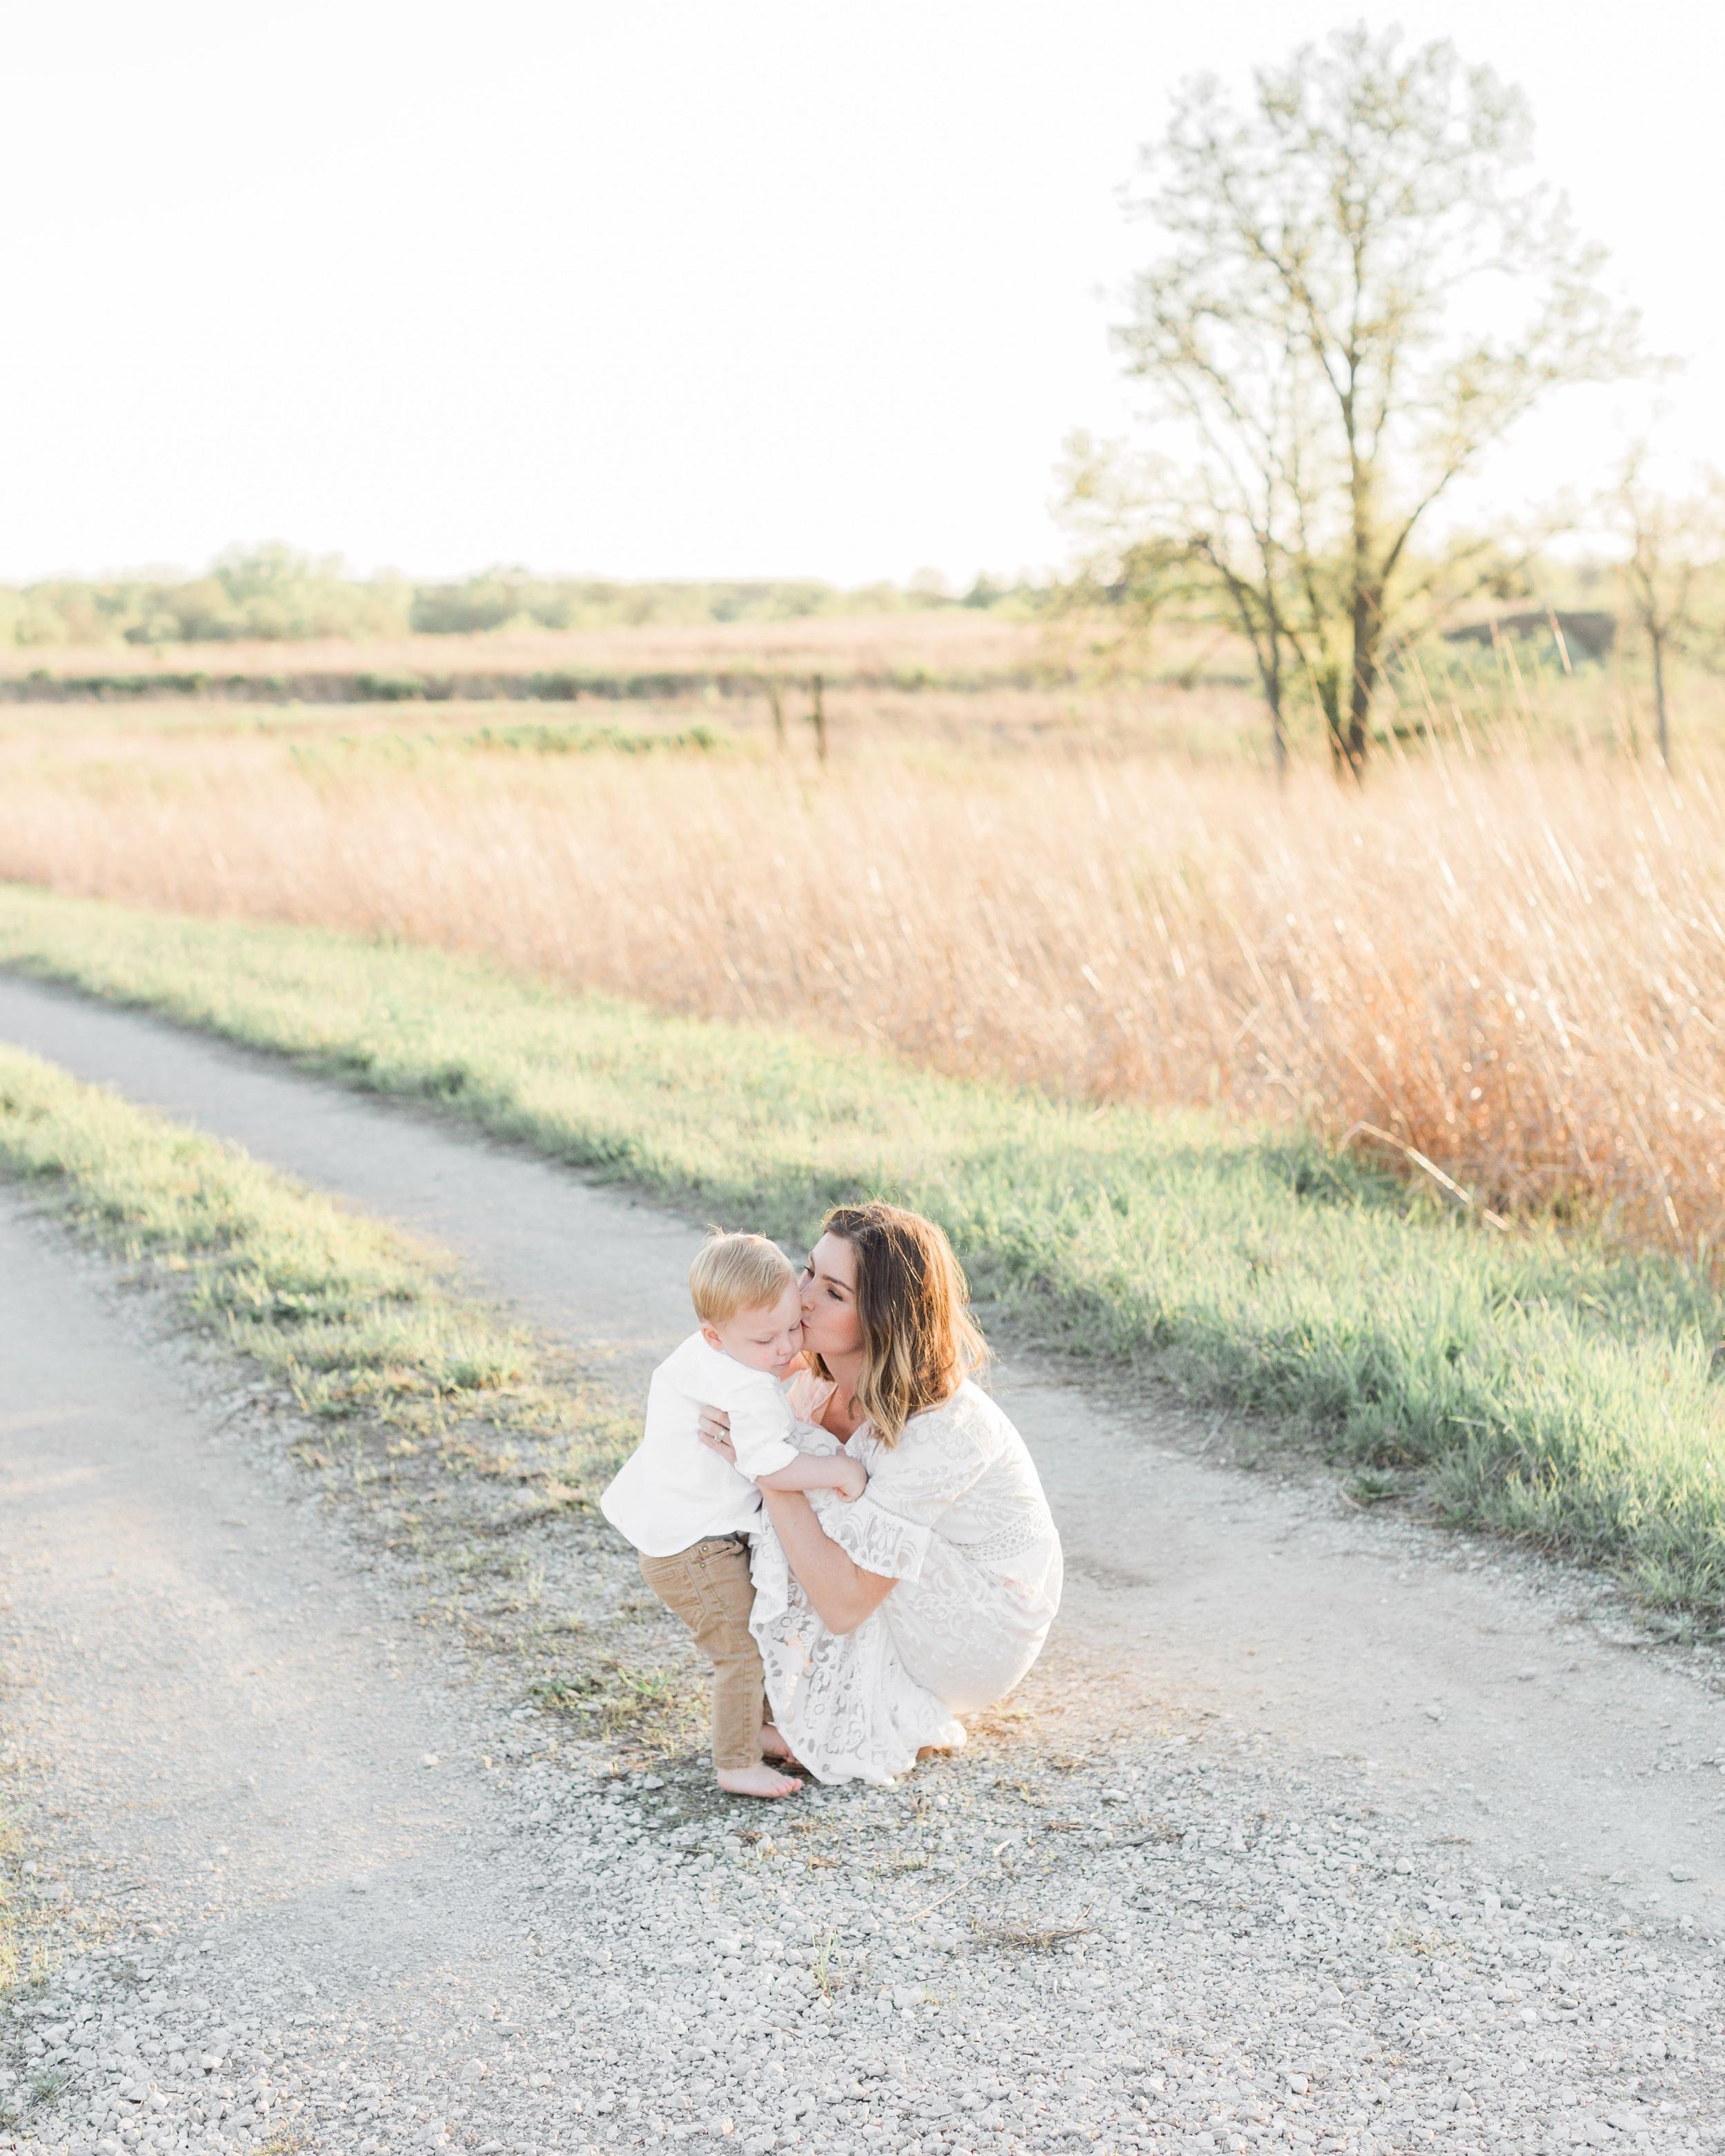 Margaret Matheny - healthy. simple. minimal. motherhood.